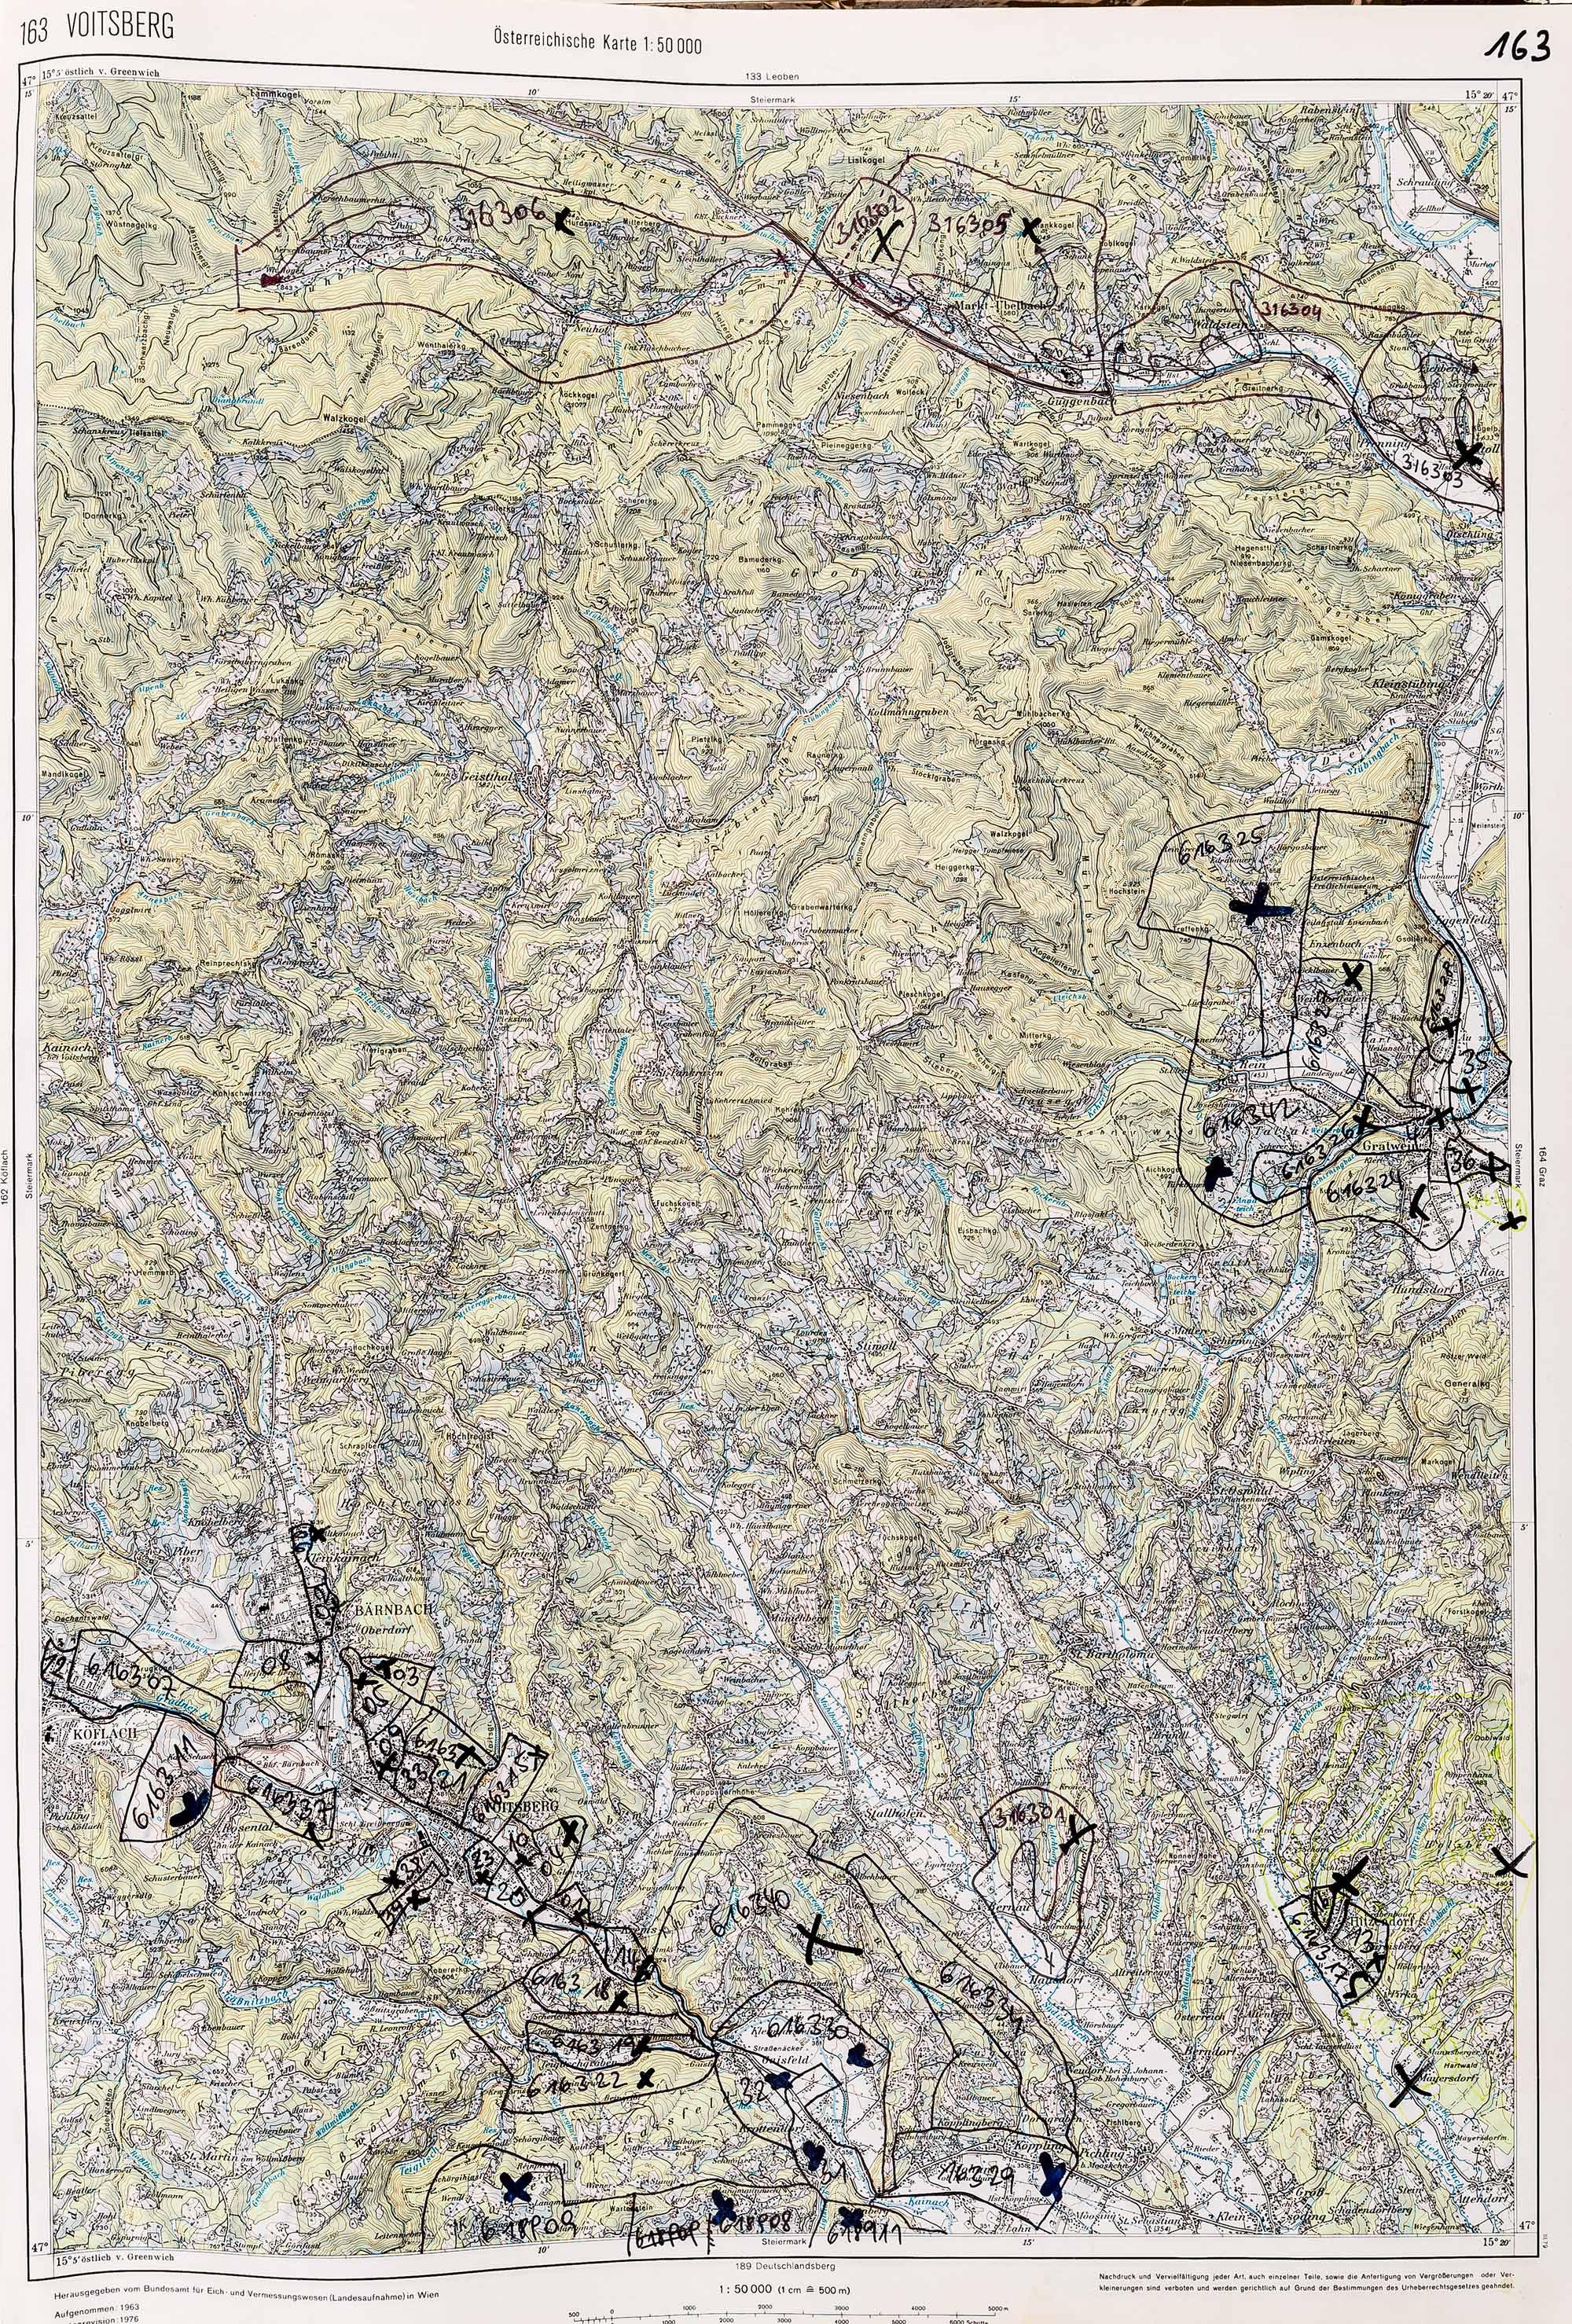 1983-1986 Karte 163